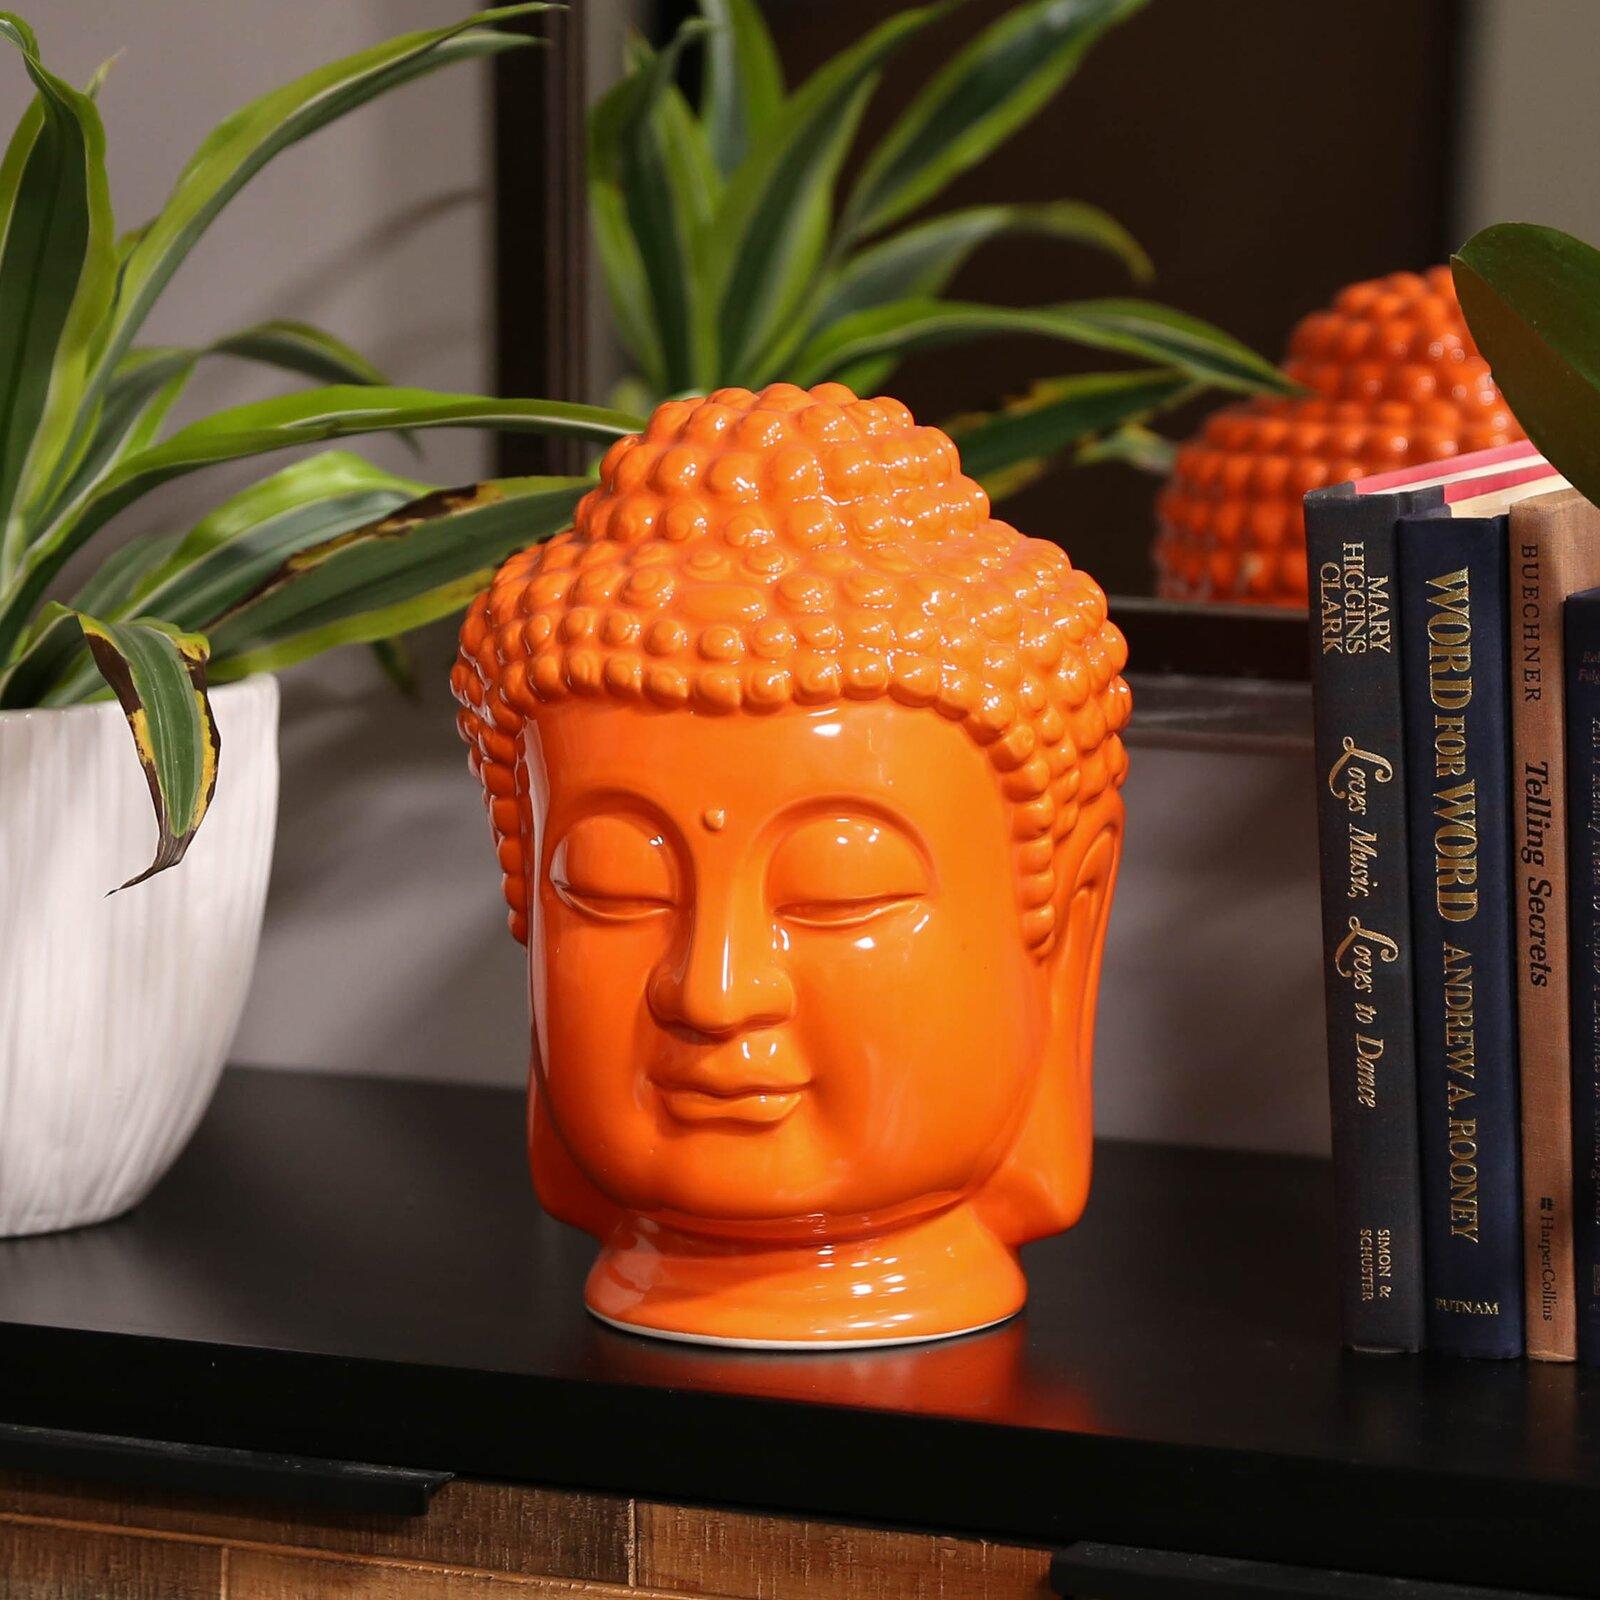 modern-buddha-statue-for-sale-online-bright-orange-ceramic-buddhist-sculpture-glossy-finish-creative-decor-ideas-for-spiritual-contemporary-home